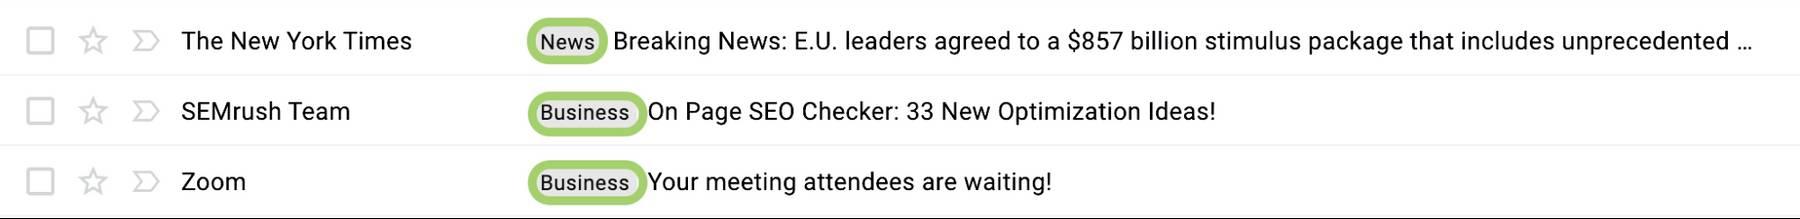 Example of semi-unstrcutured data: emails